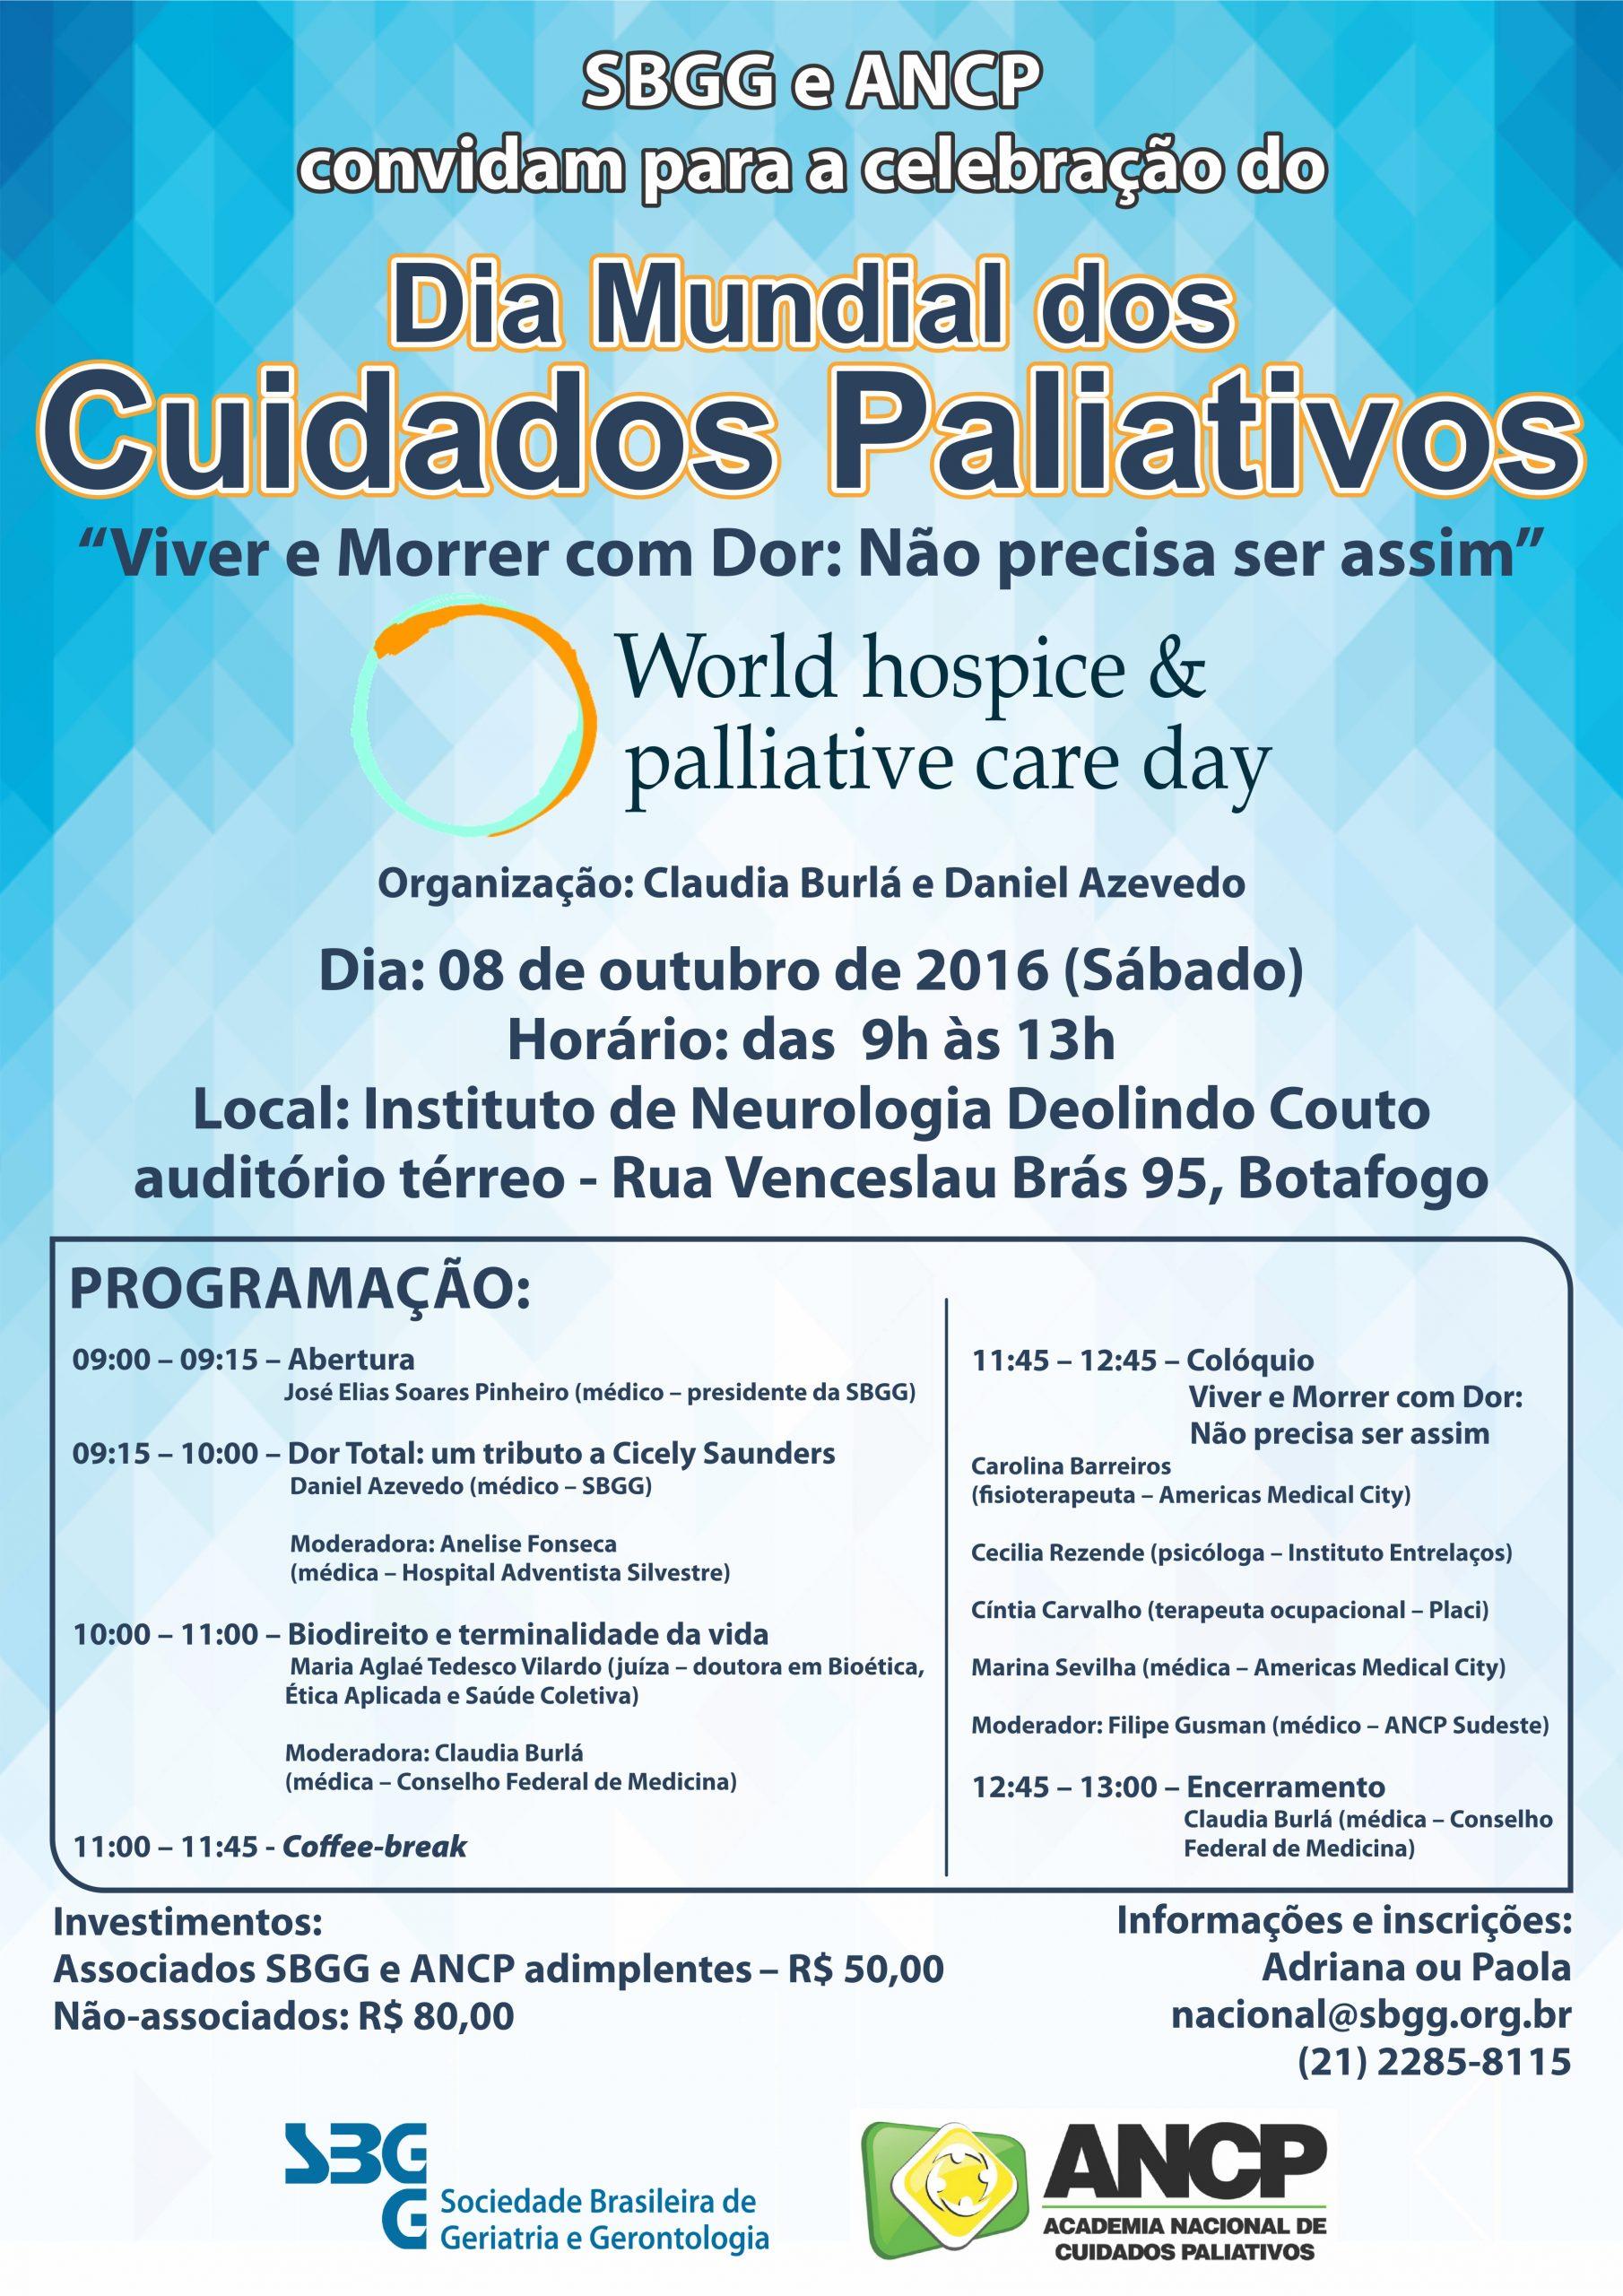 Dia Mundial dos Cuidados Paliativos